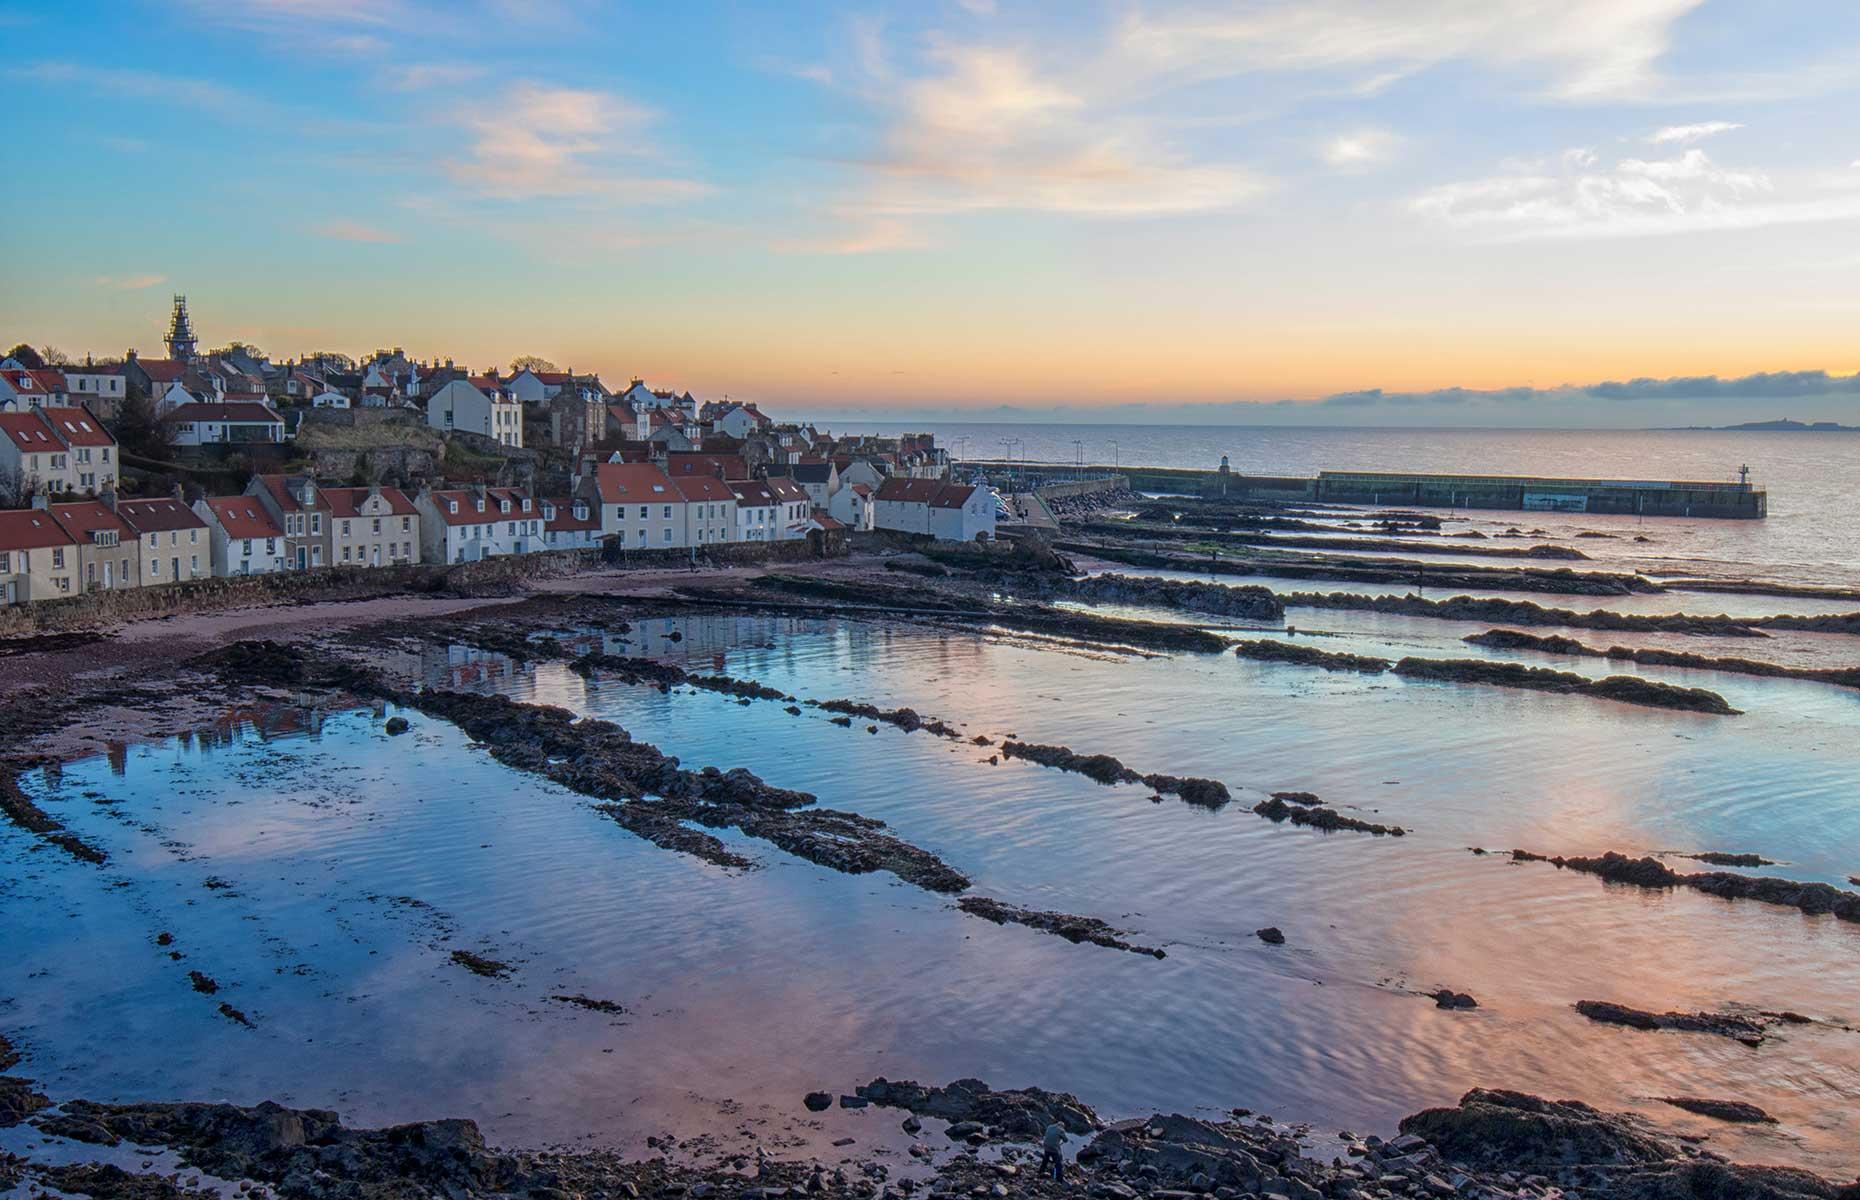 Pittenweem, Scotland (Image: orlando alberghi/Shutterstock)